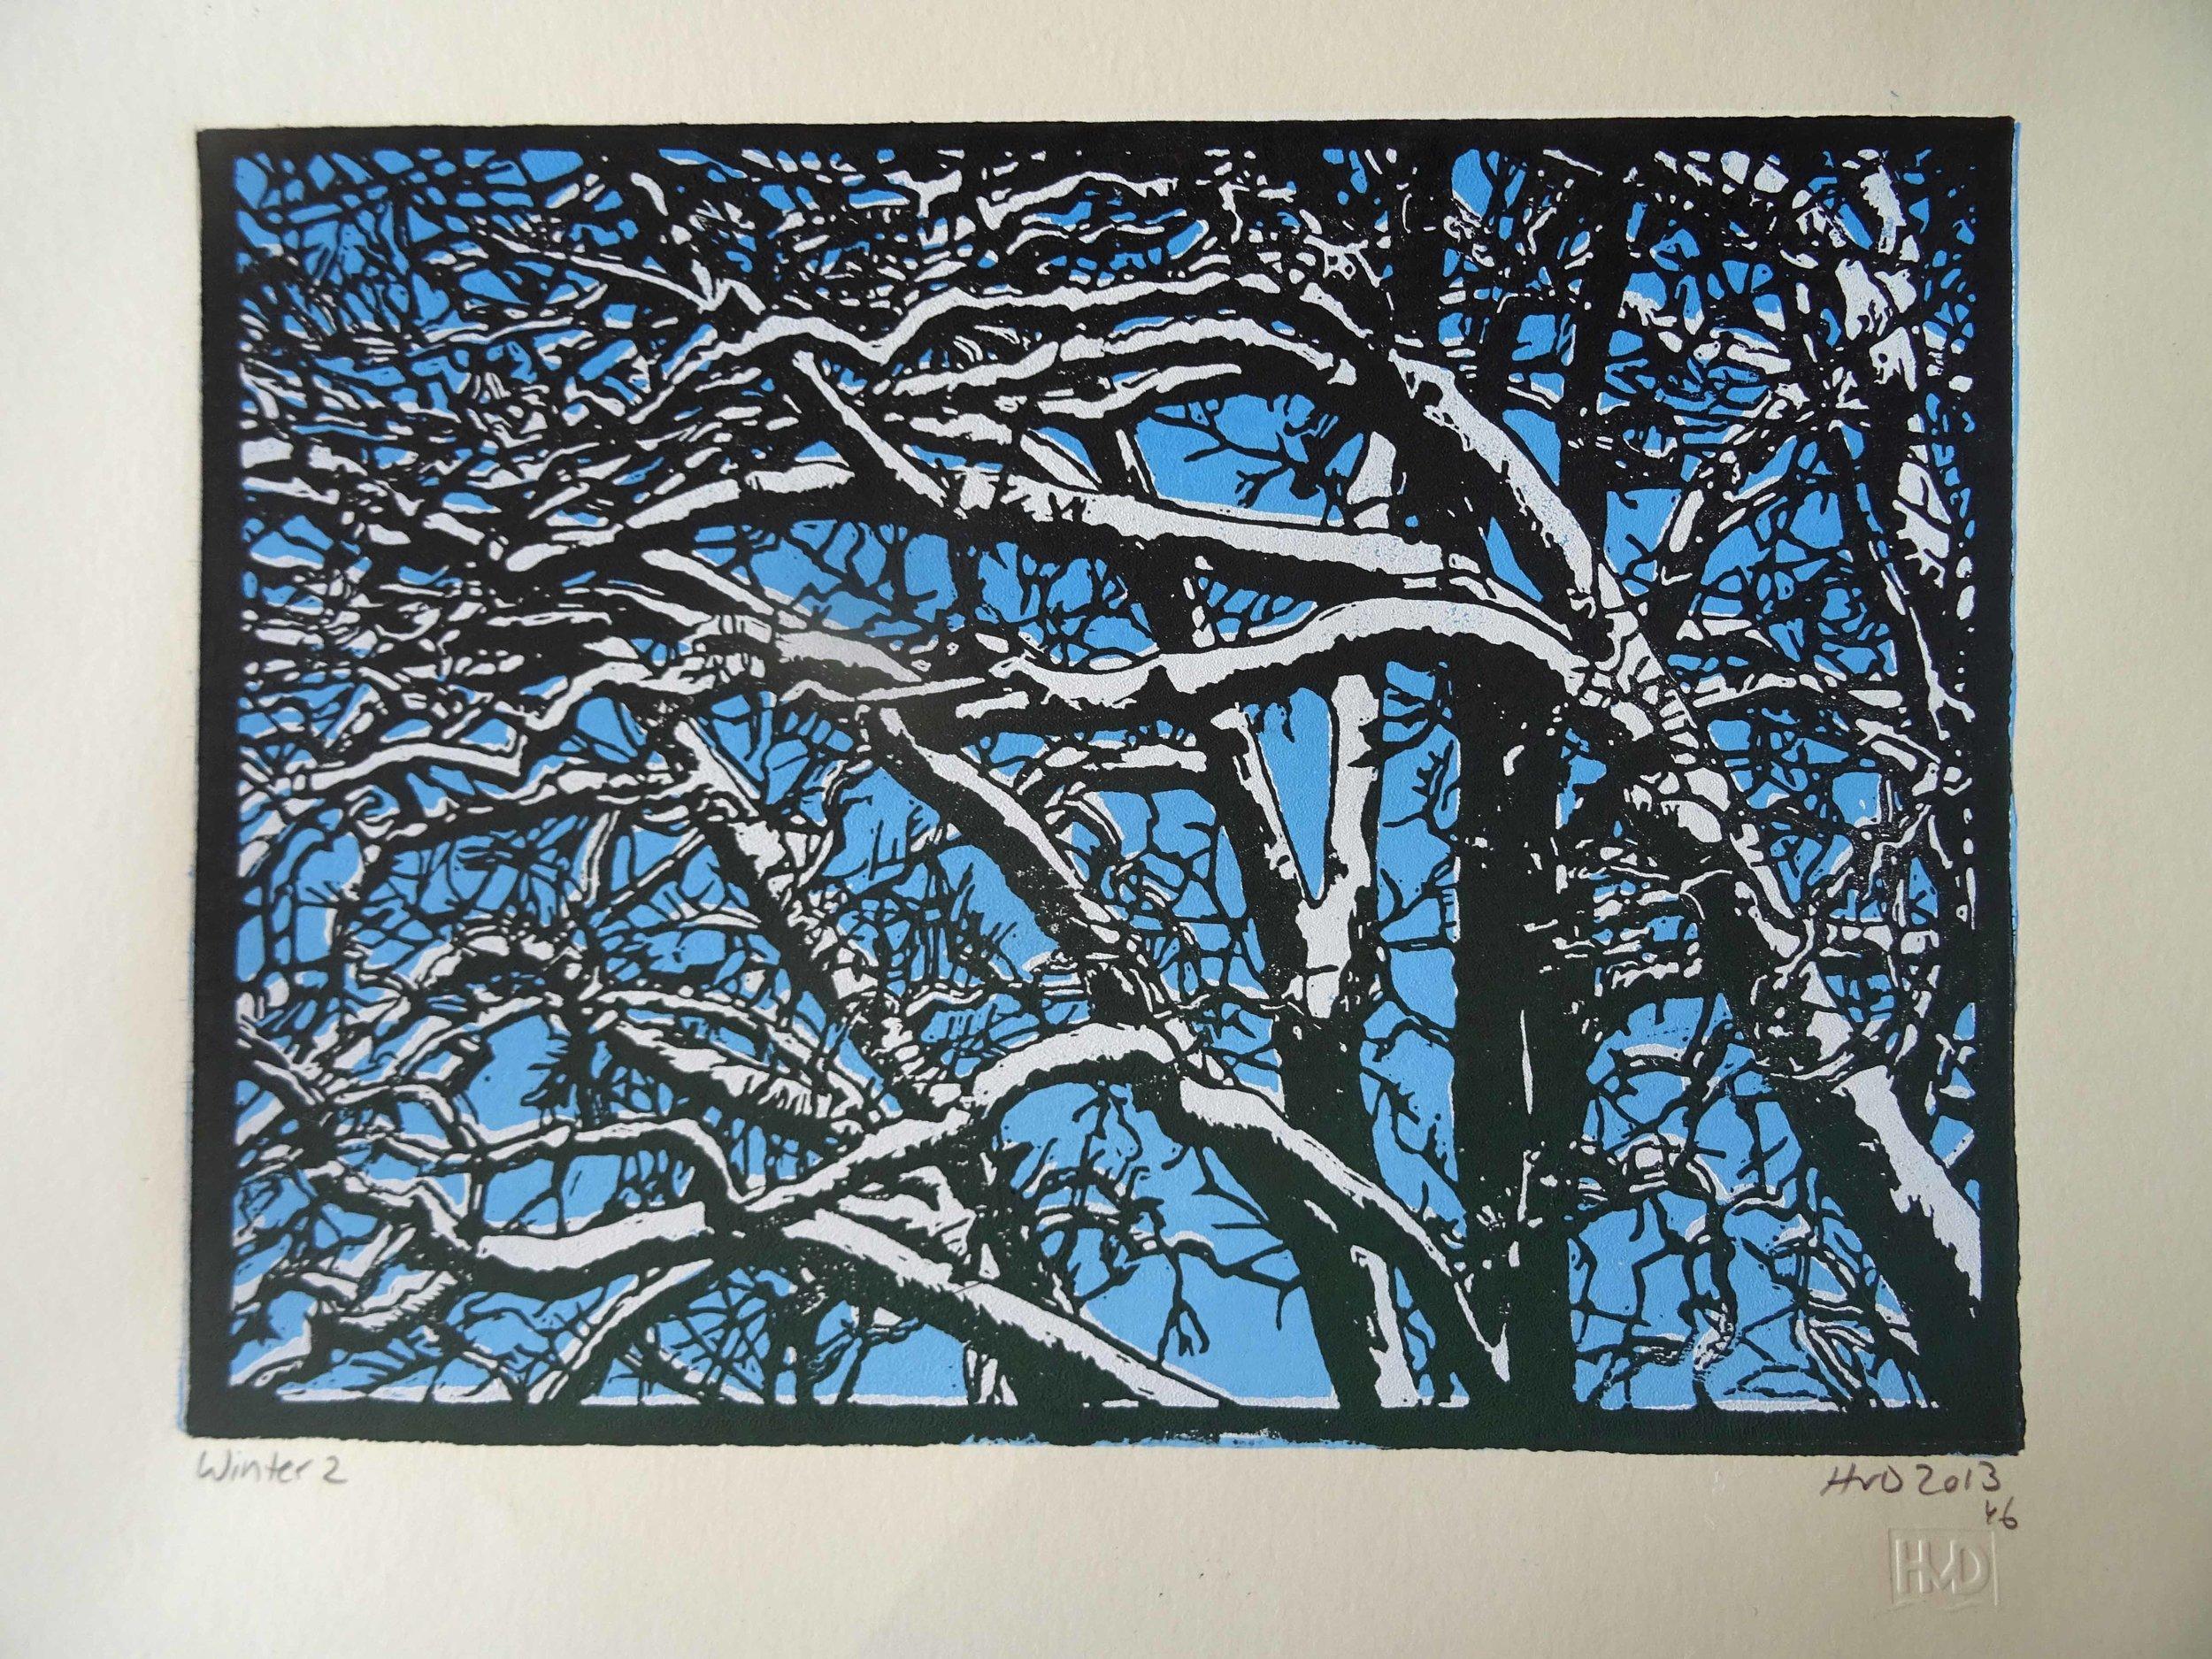 135-7, winter trees, 21x30cm, 3-plate lino, 80 €